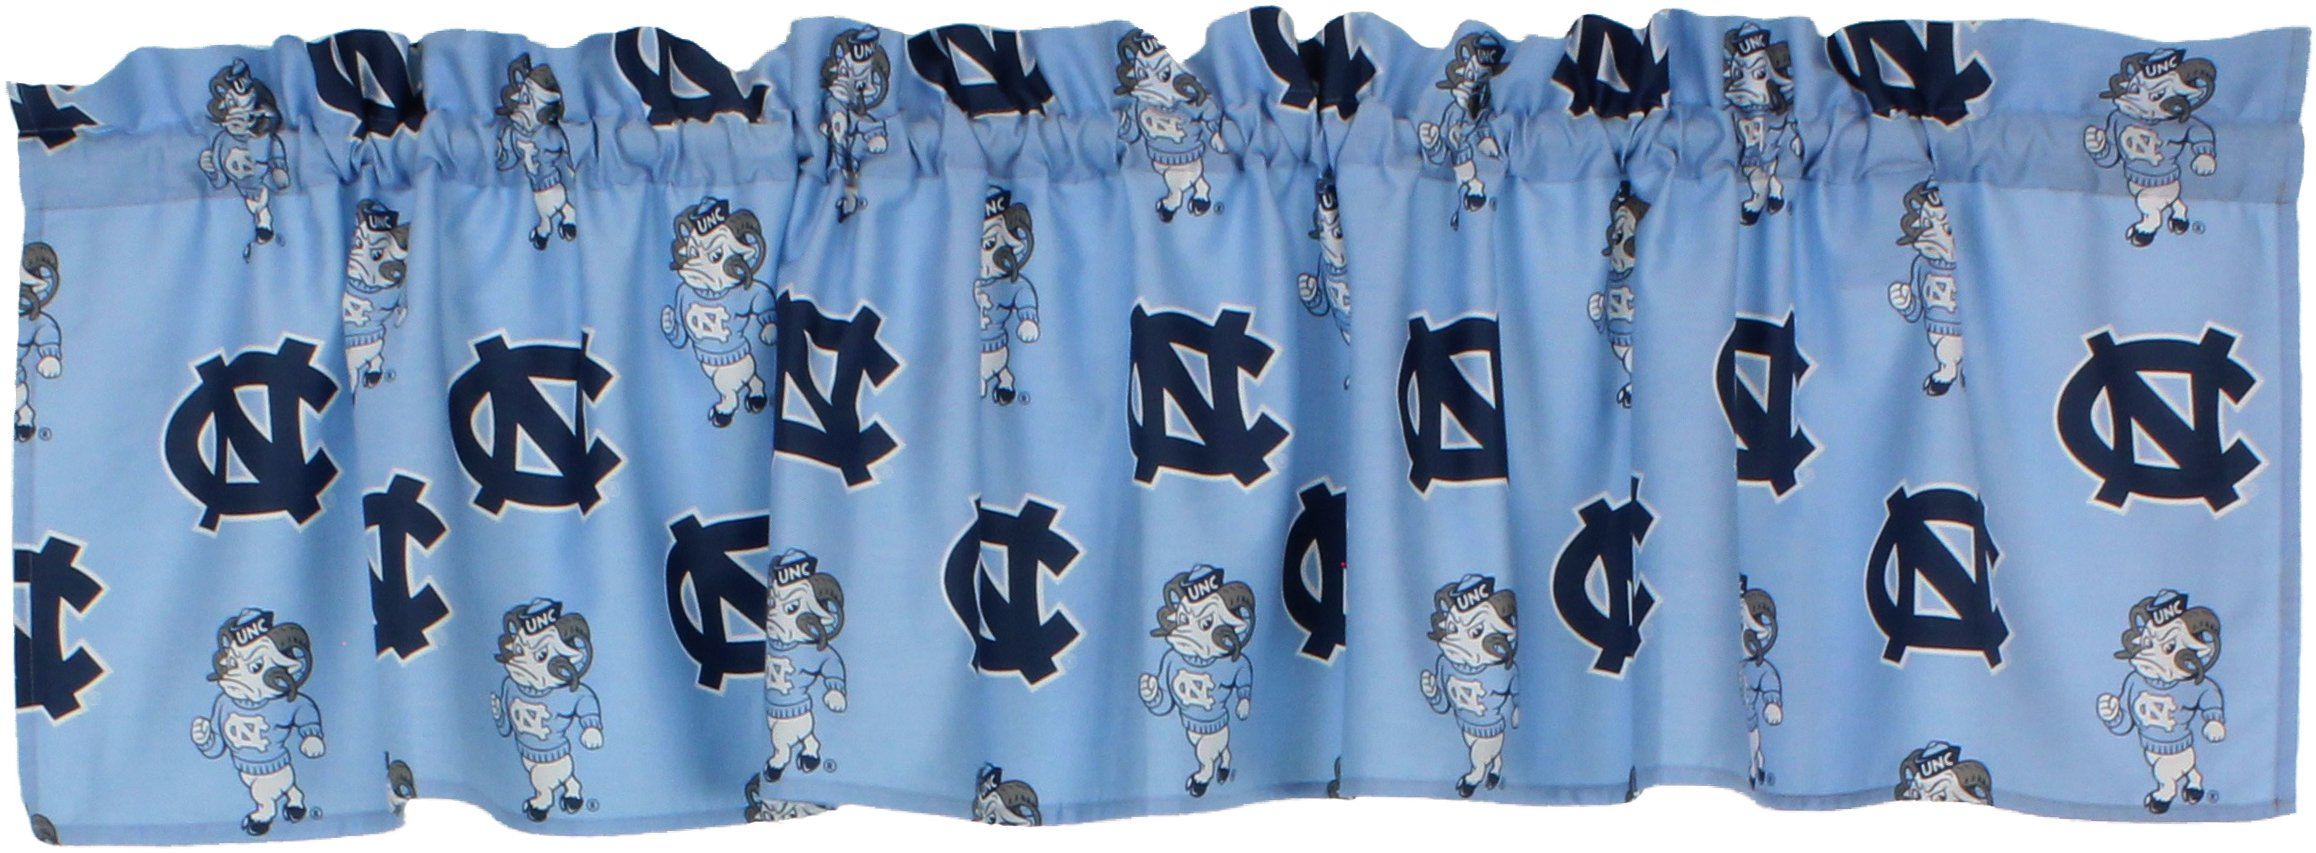 College Covers International North Carolina Tar Heels Printed Curtain Valance - 84'' X 15''